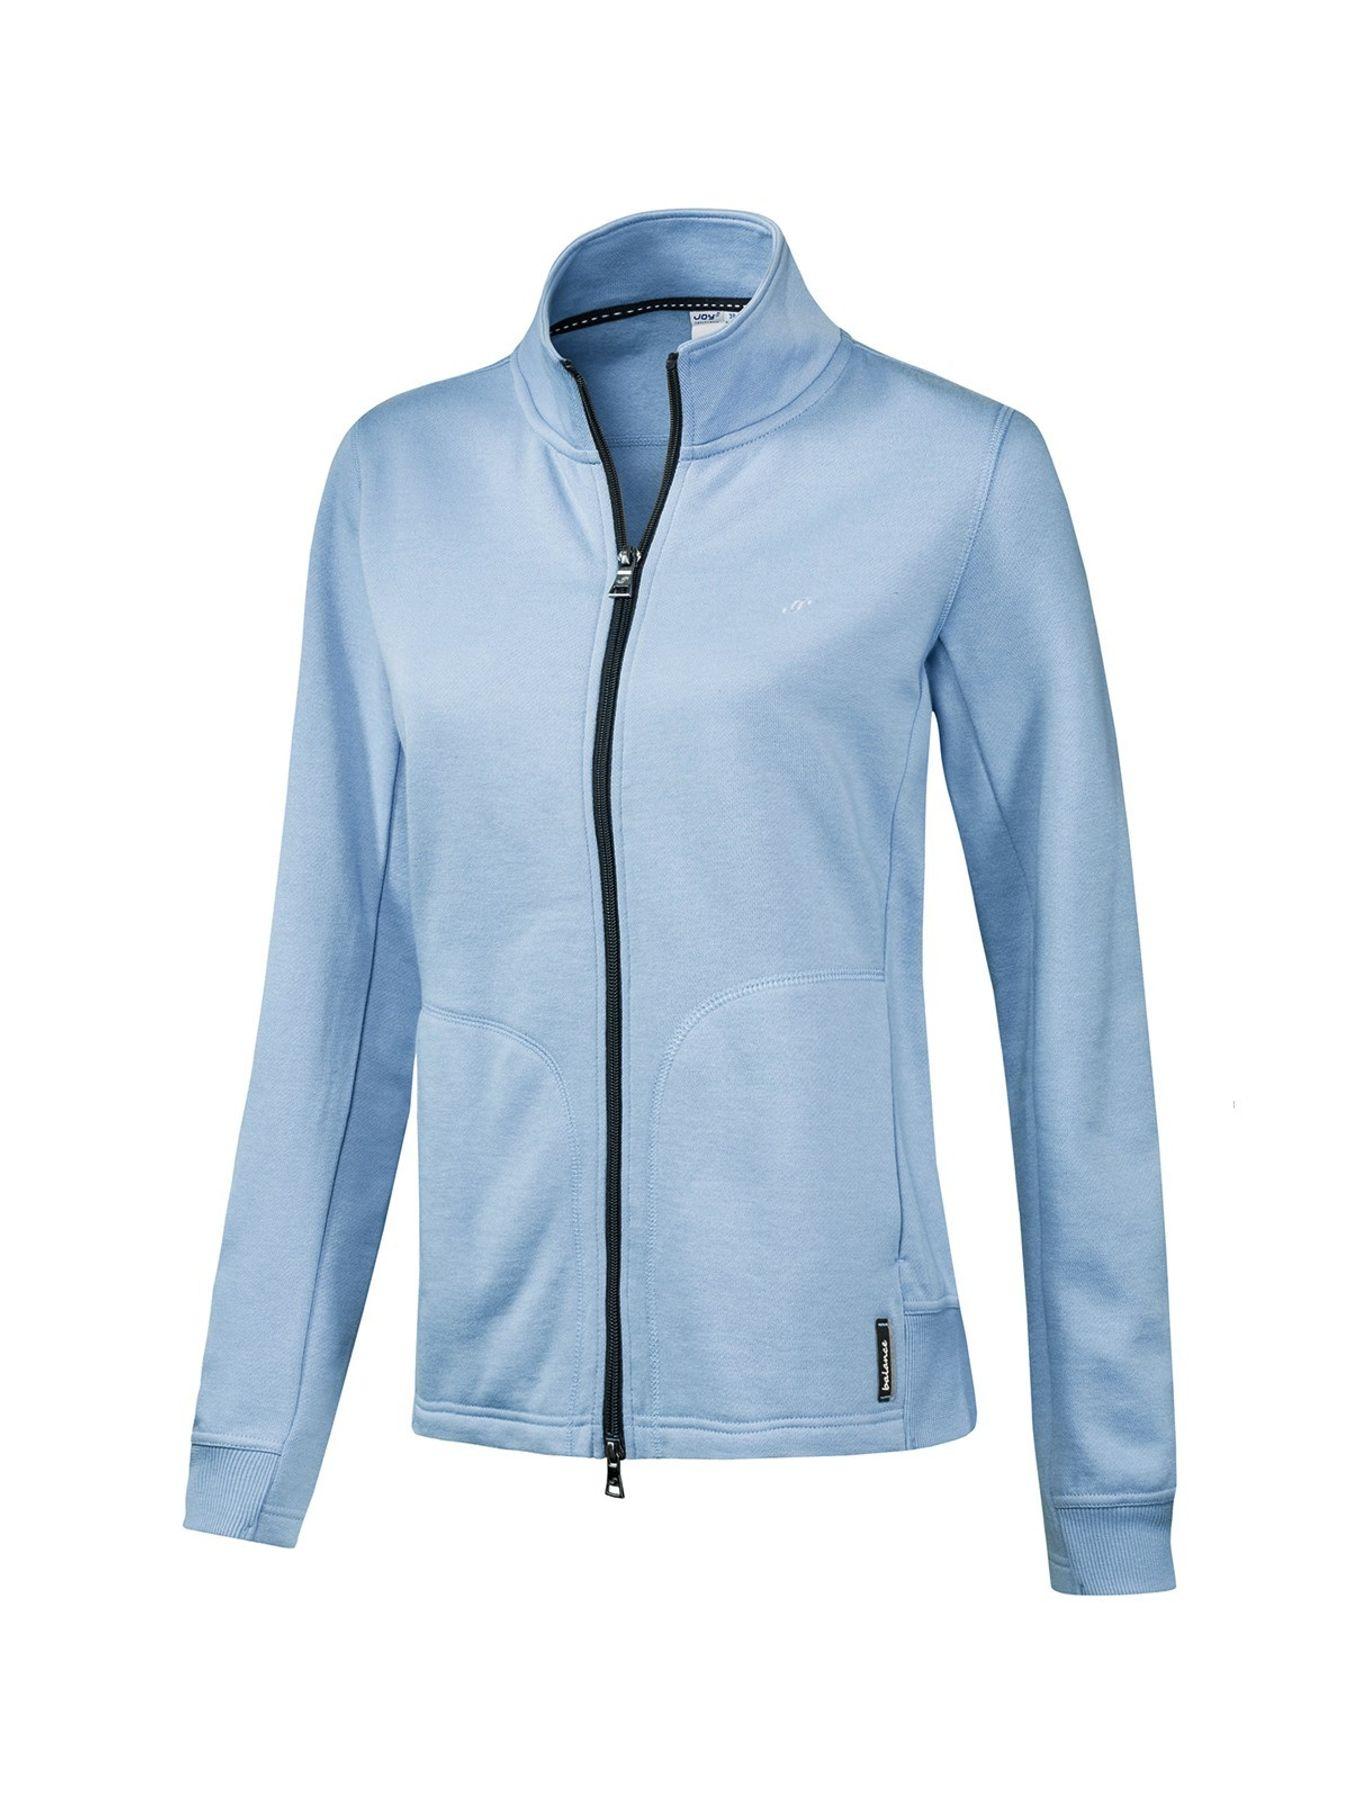 Joy - Damen Sport und Freizeit Jacke in mehreren Farben, Paulina (34500) – Bild 1